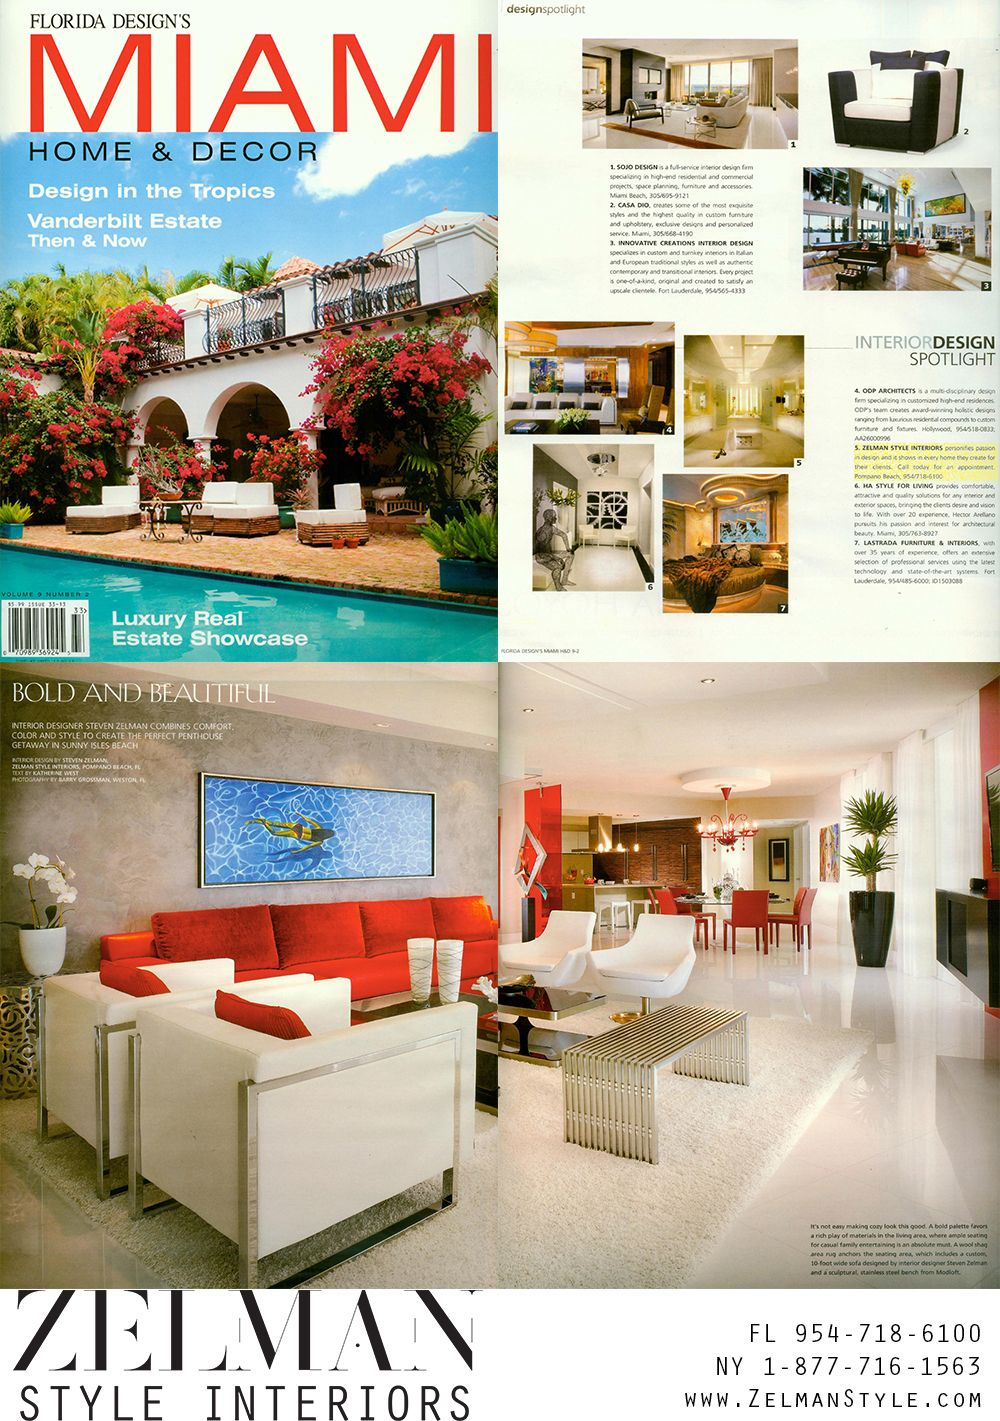 Miami Home And Decor Magazine Features Zelman Interiors Mia365